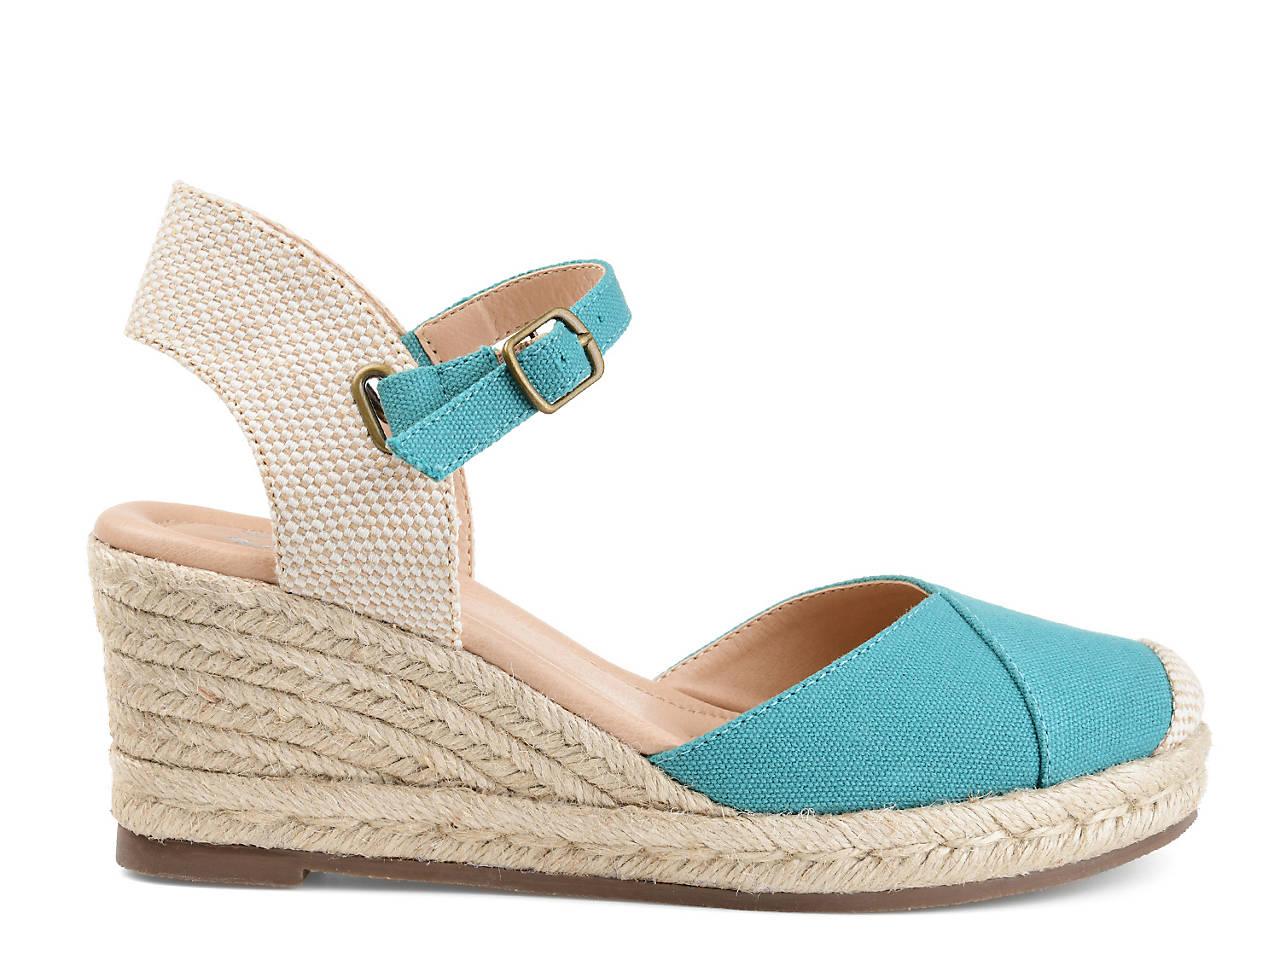 Journee Collection Ashlyn Espadrille Wedge Sandal Women's